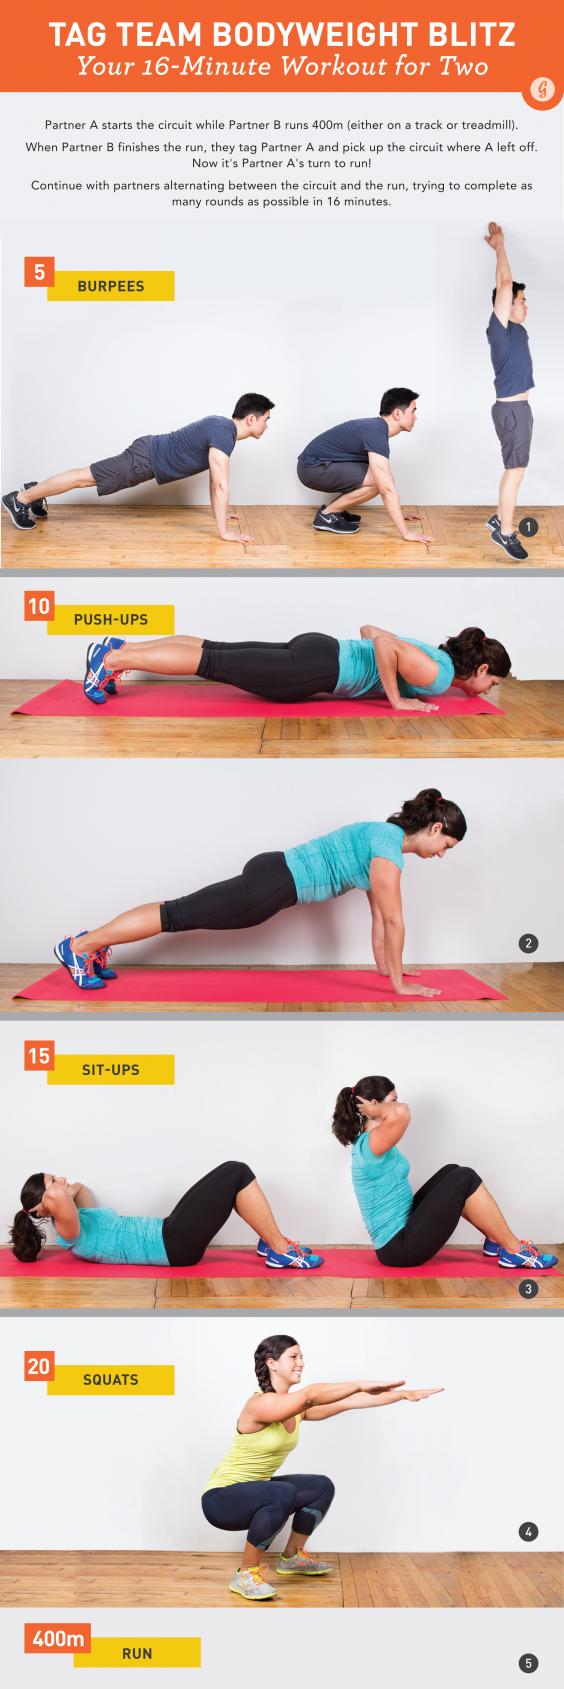 16 Minute Partner Workout